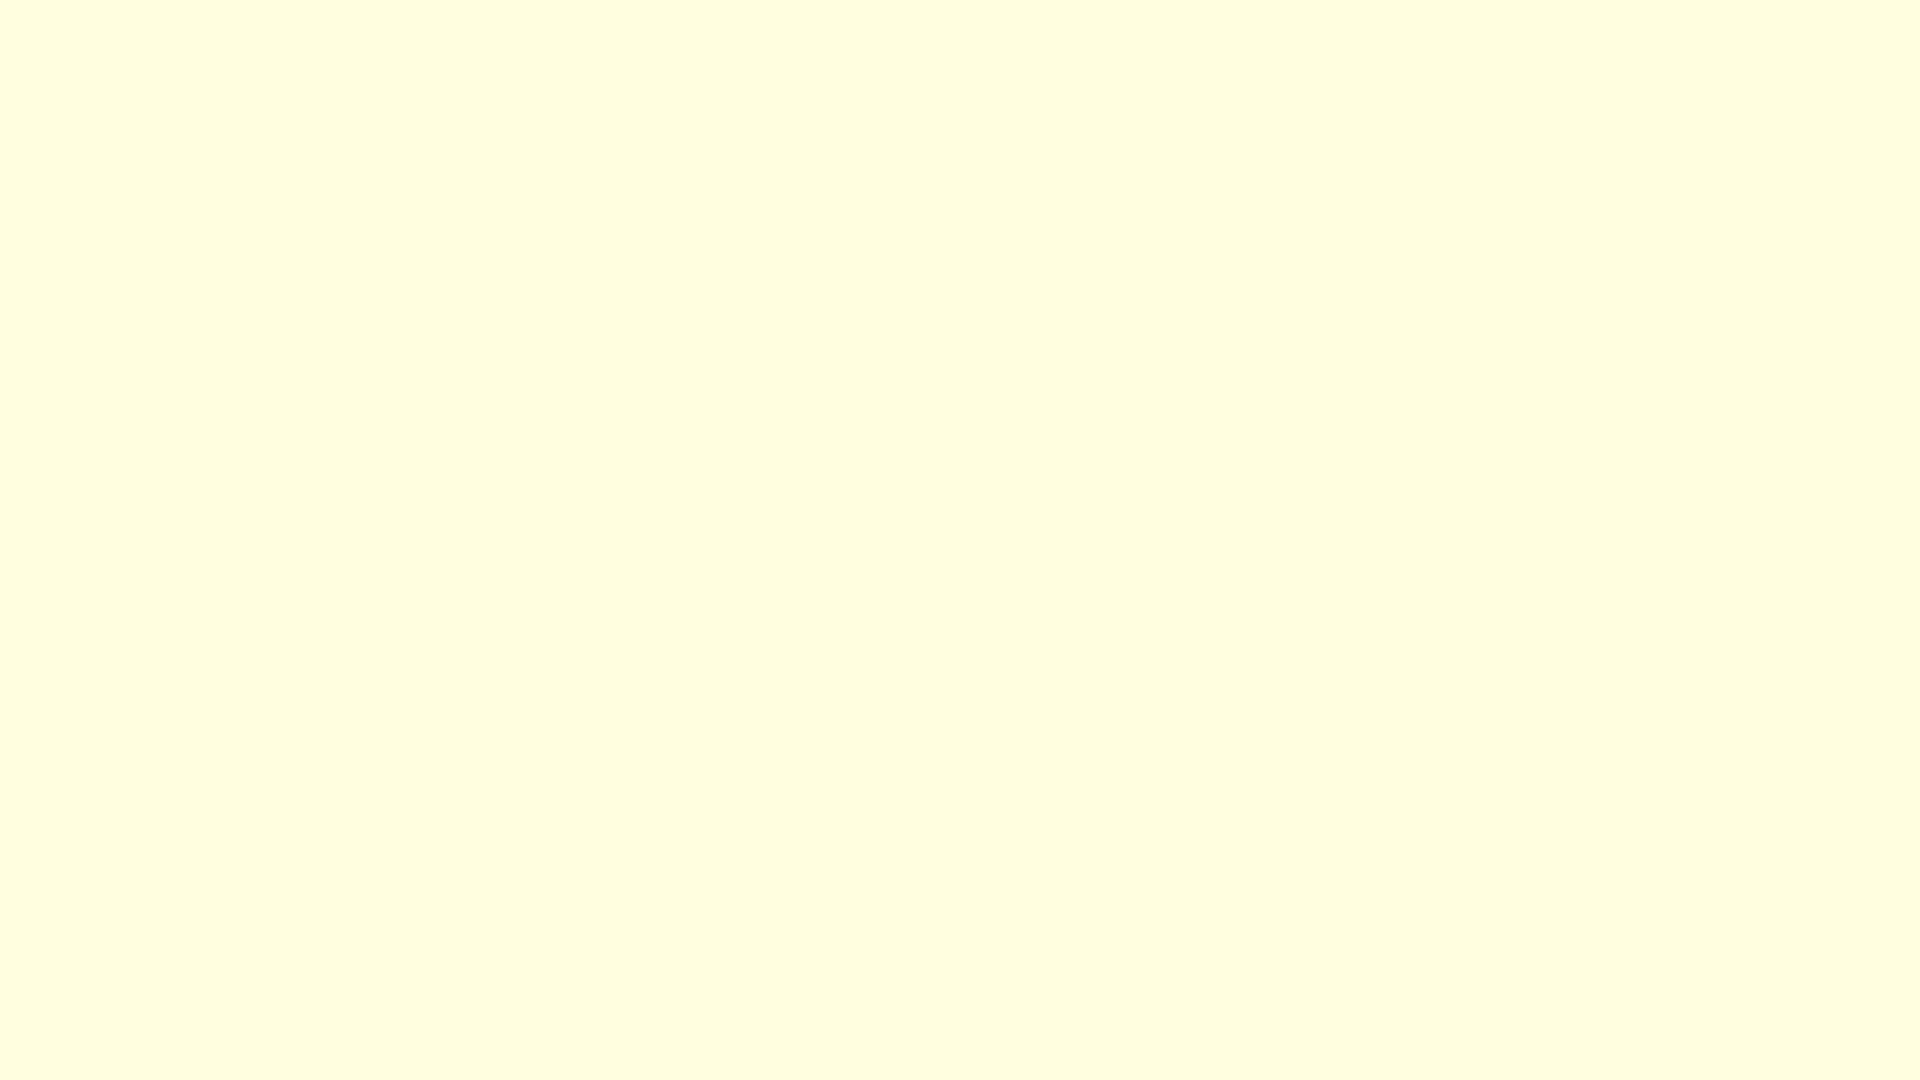 Pastel Colors Wallpaper ·① WallpaperTag